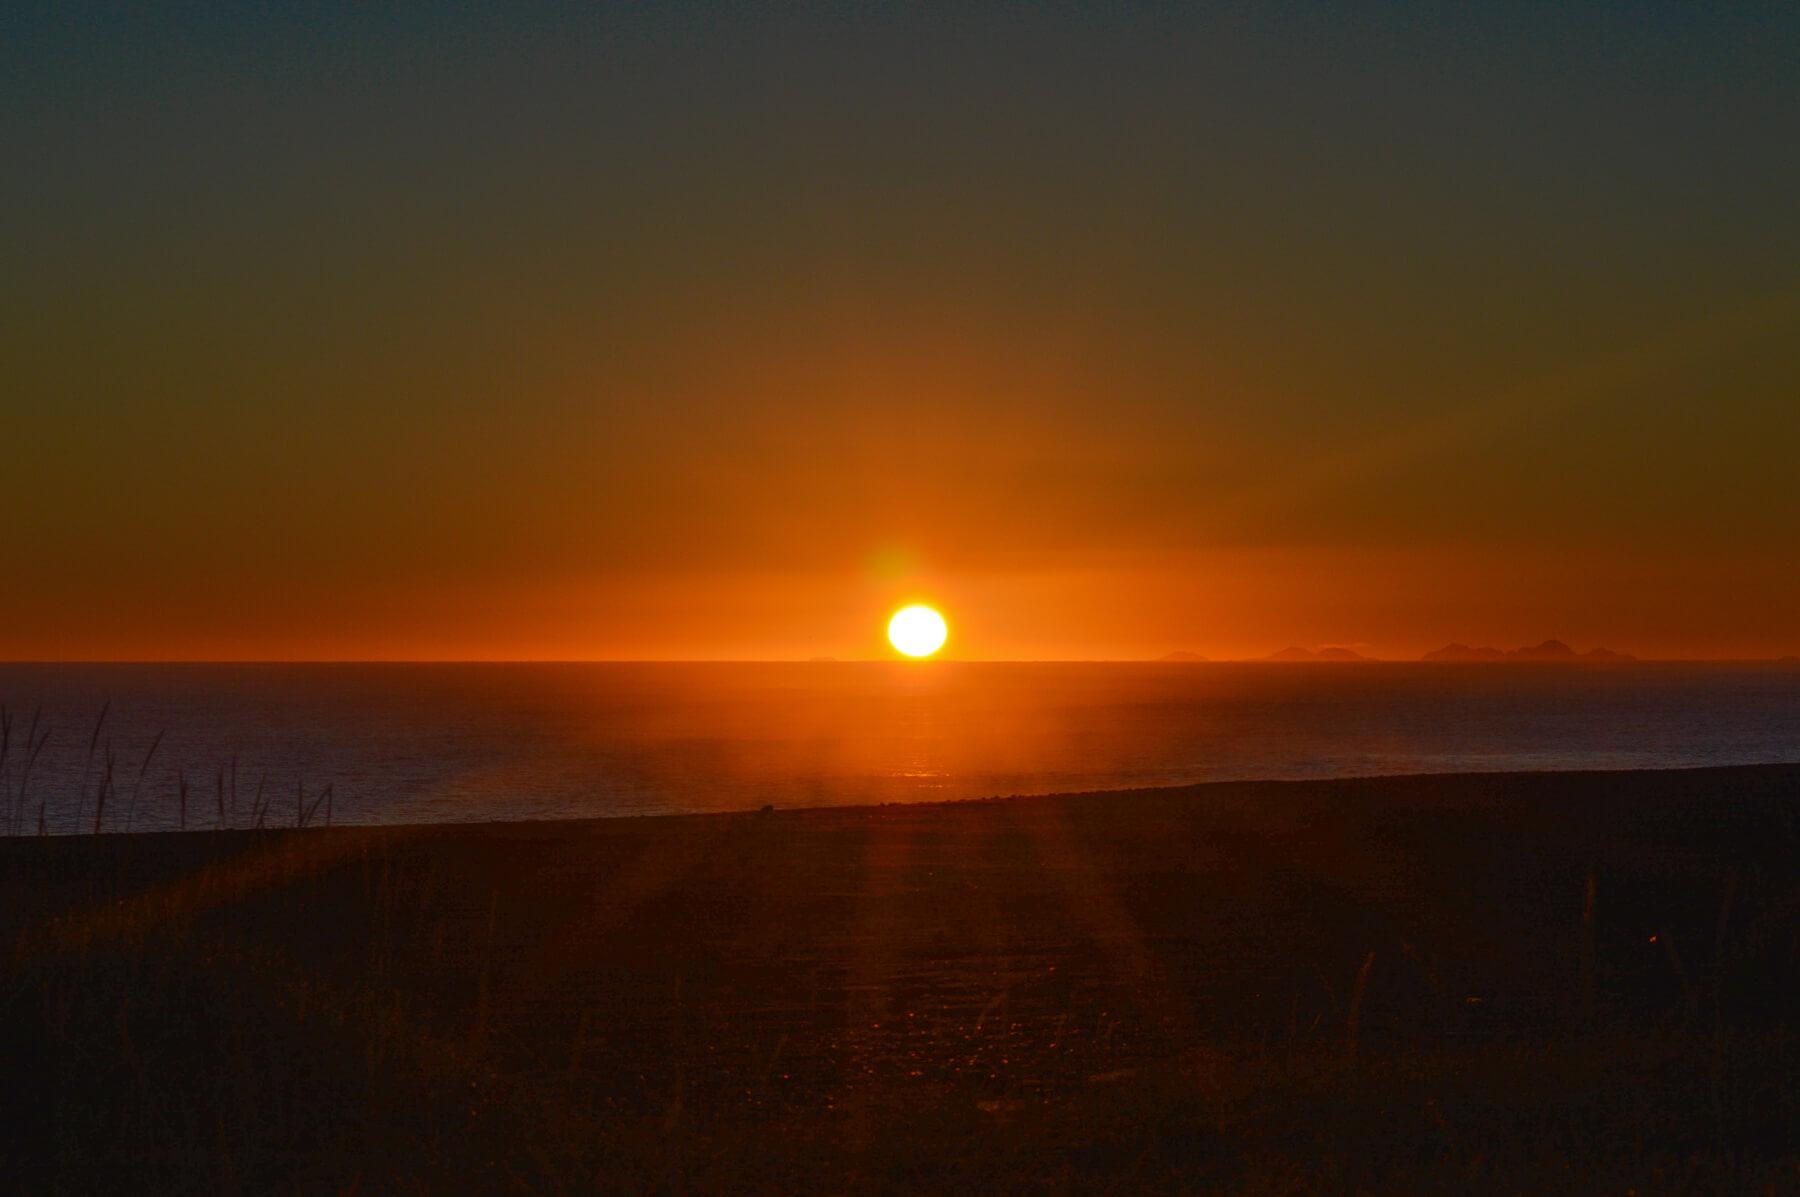 Orange sun shining over the horizon